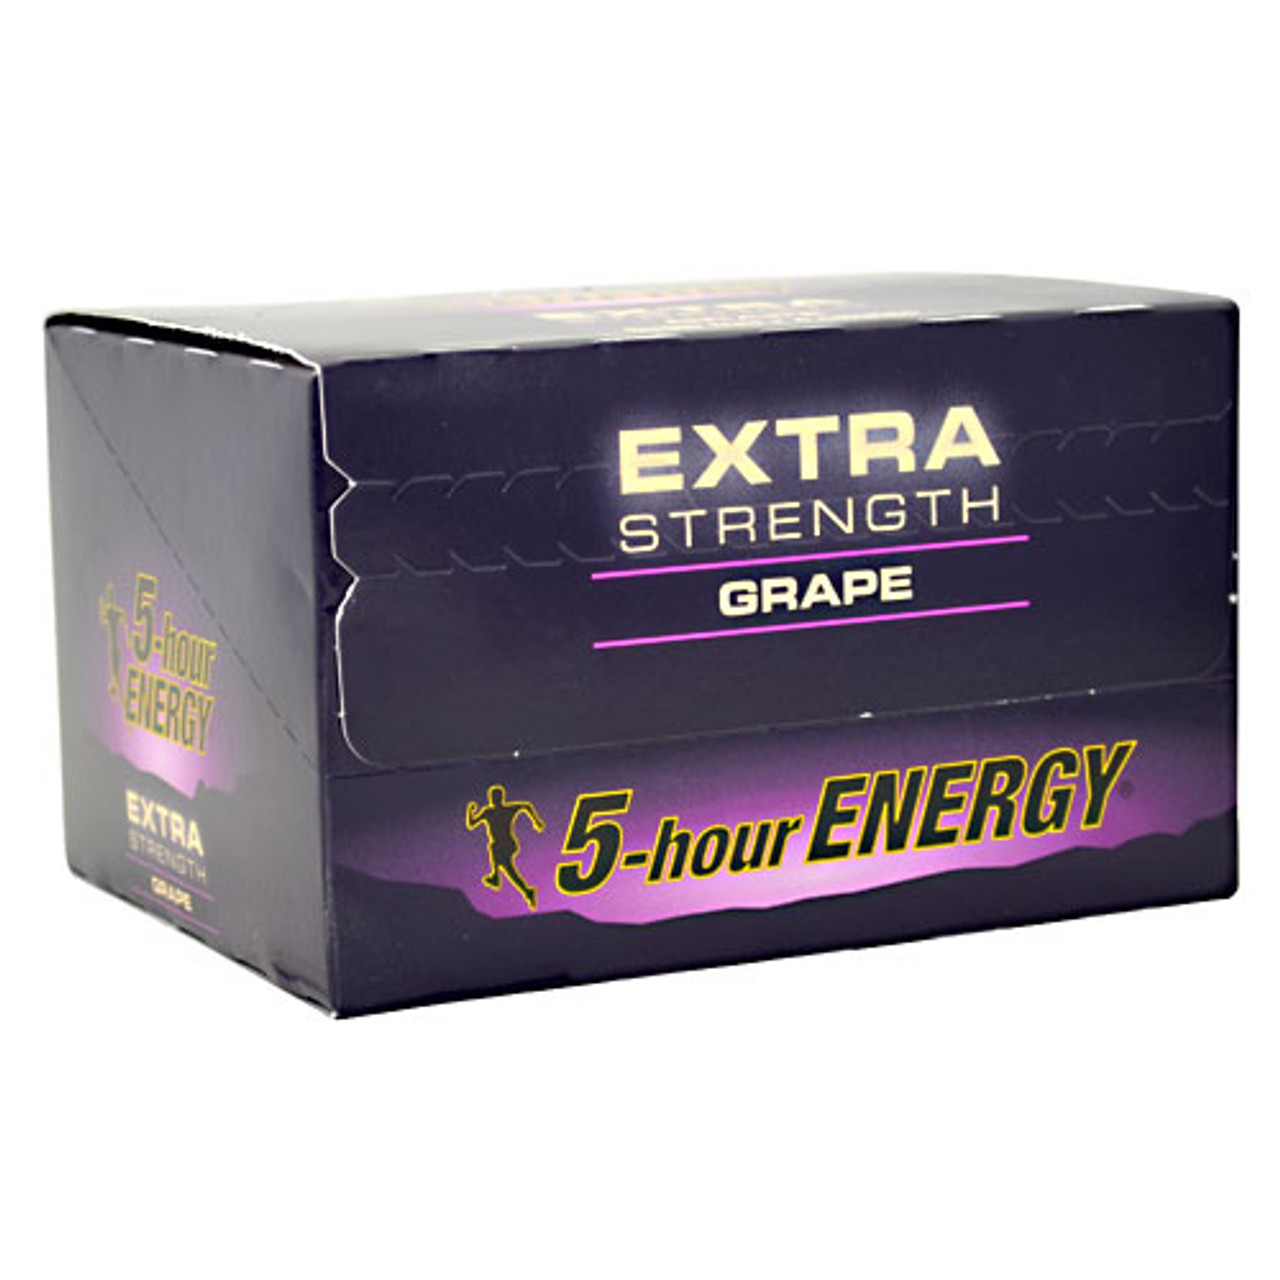 5-Hour Energy Extra Strength by Living Essentials 12ct